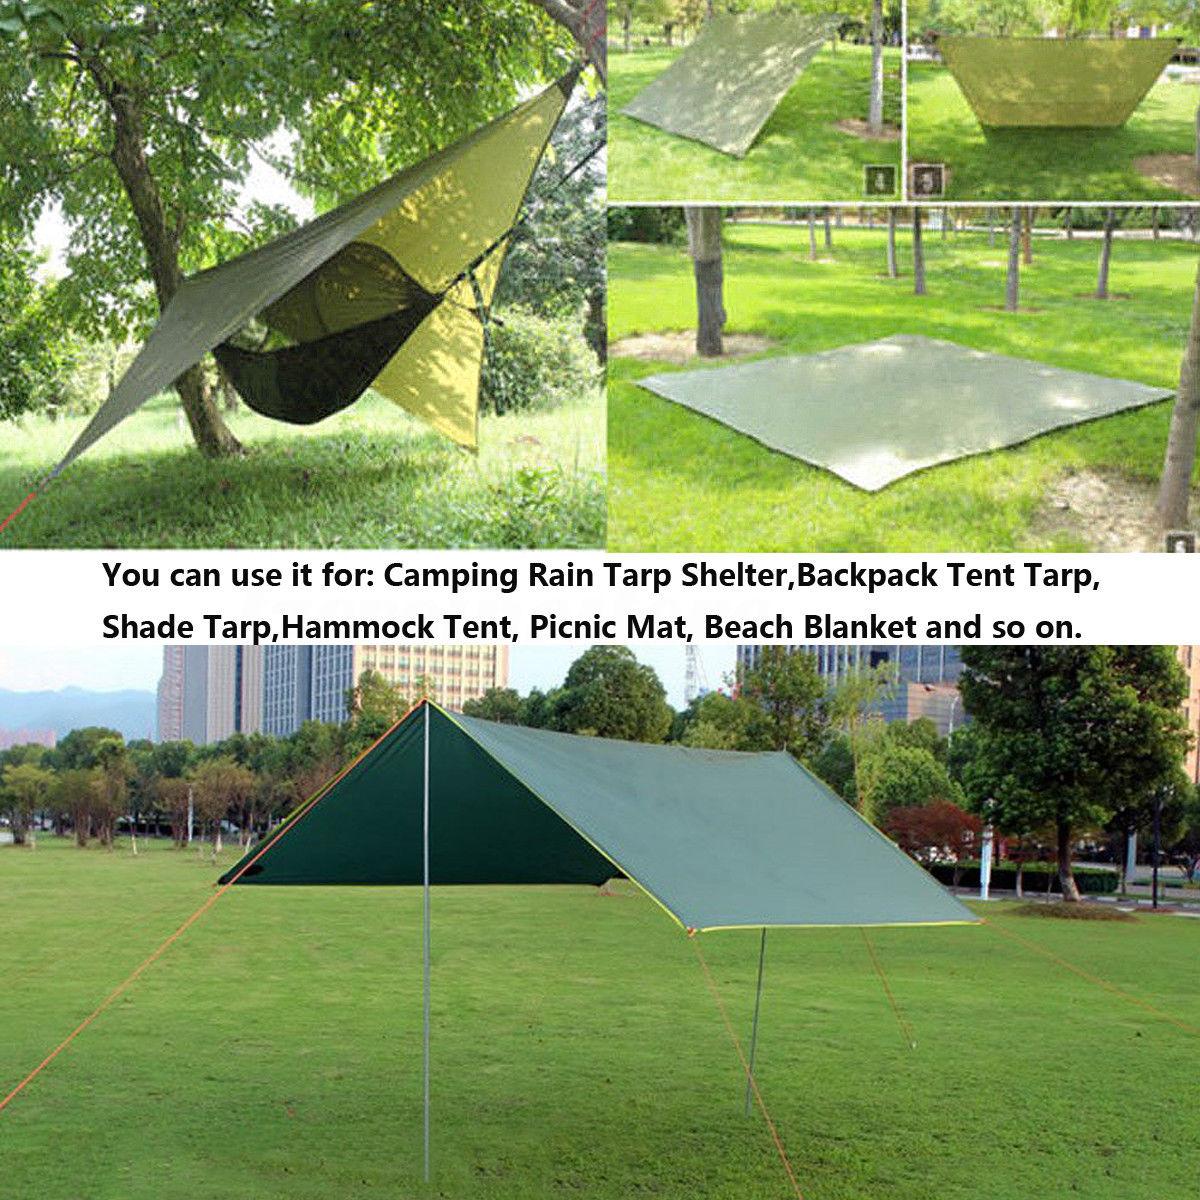 8 31 Gbp Caravan Awning Tent Camping Picnic Beach Mat Mattress Groundsheet Carpet Matting Ebay Lifestyle Caravan Awnings Tent Camping Backpacking Tent